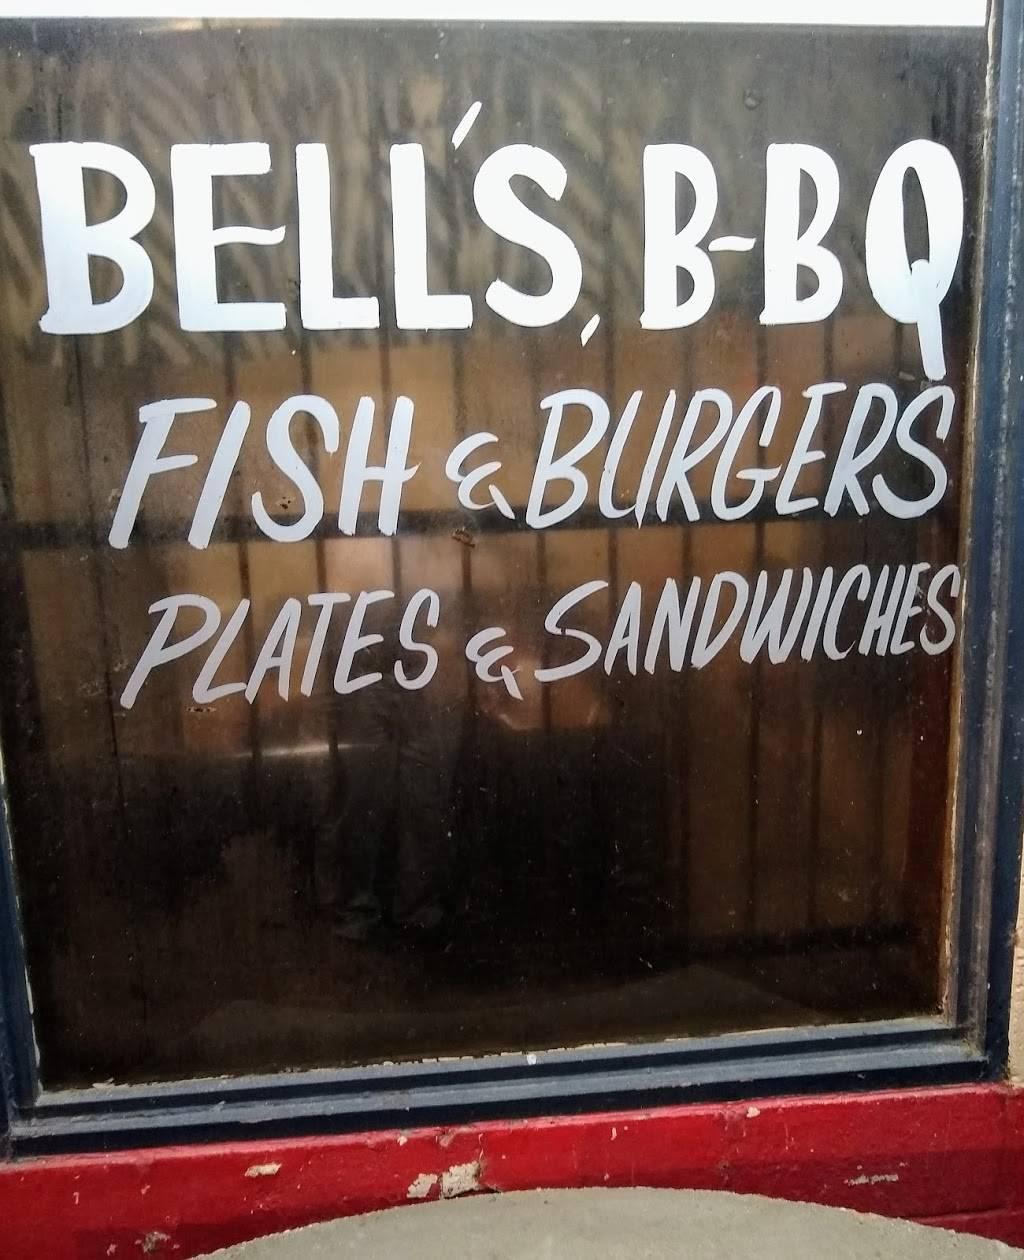 Bells BBQ | restaurant | 1357 MS-15, Maben, MS 39750, USA | 6626341256 OR +1 662-634-1256